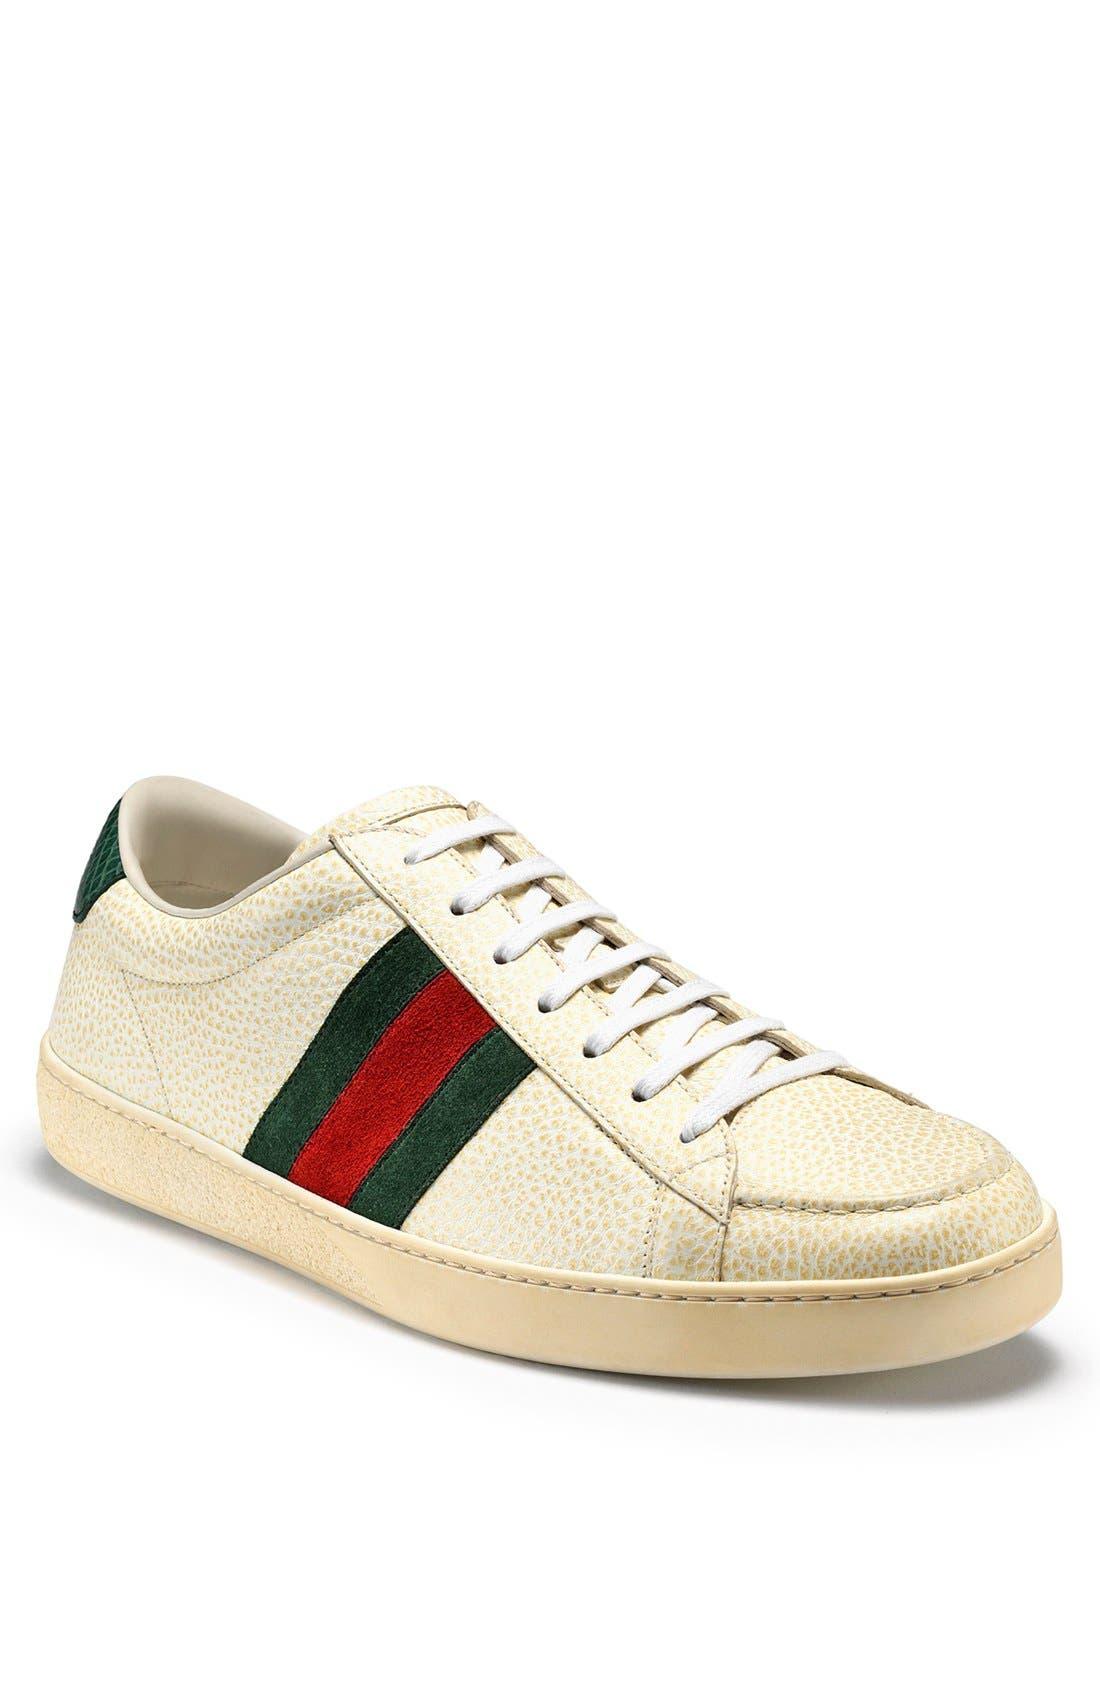 Main Image - Gucci 'Orizon' Sneaker